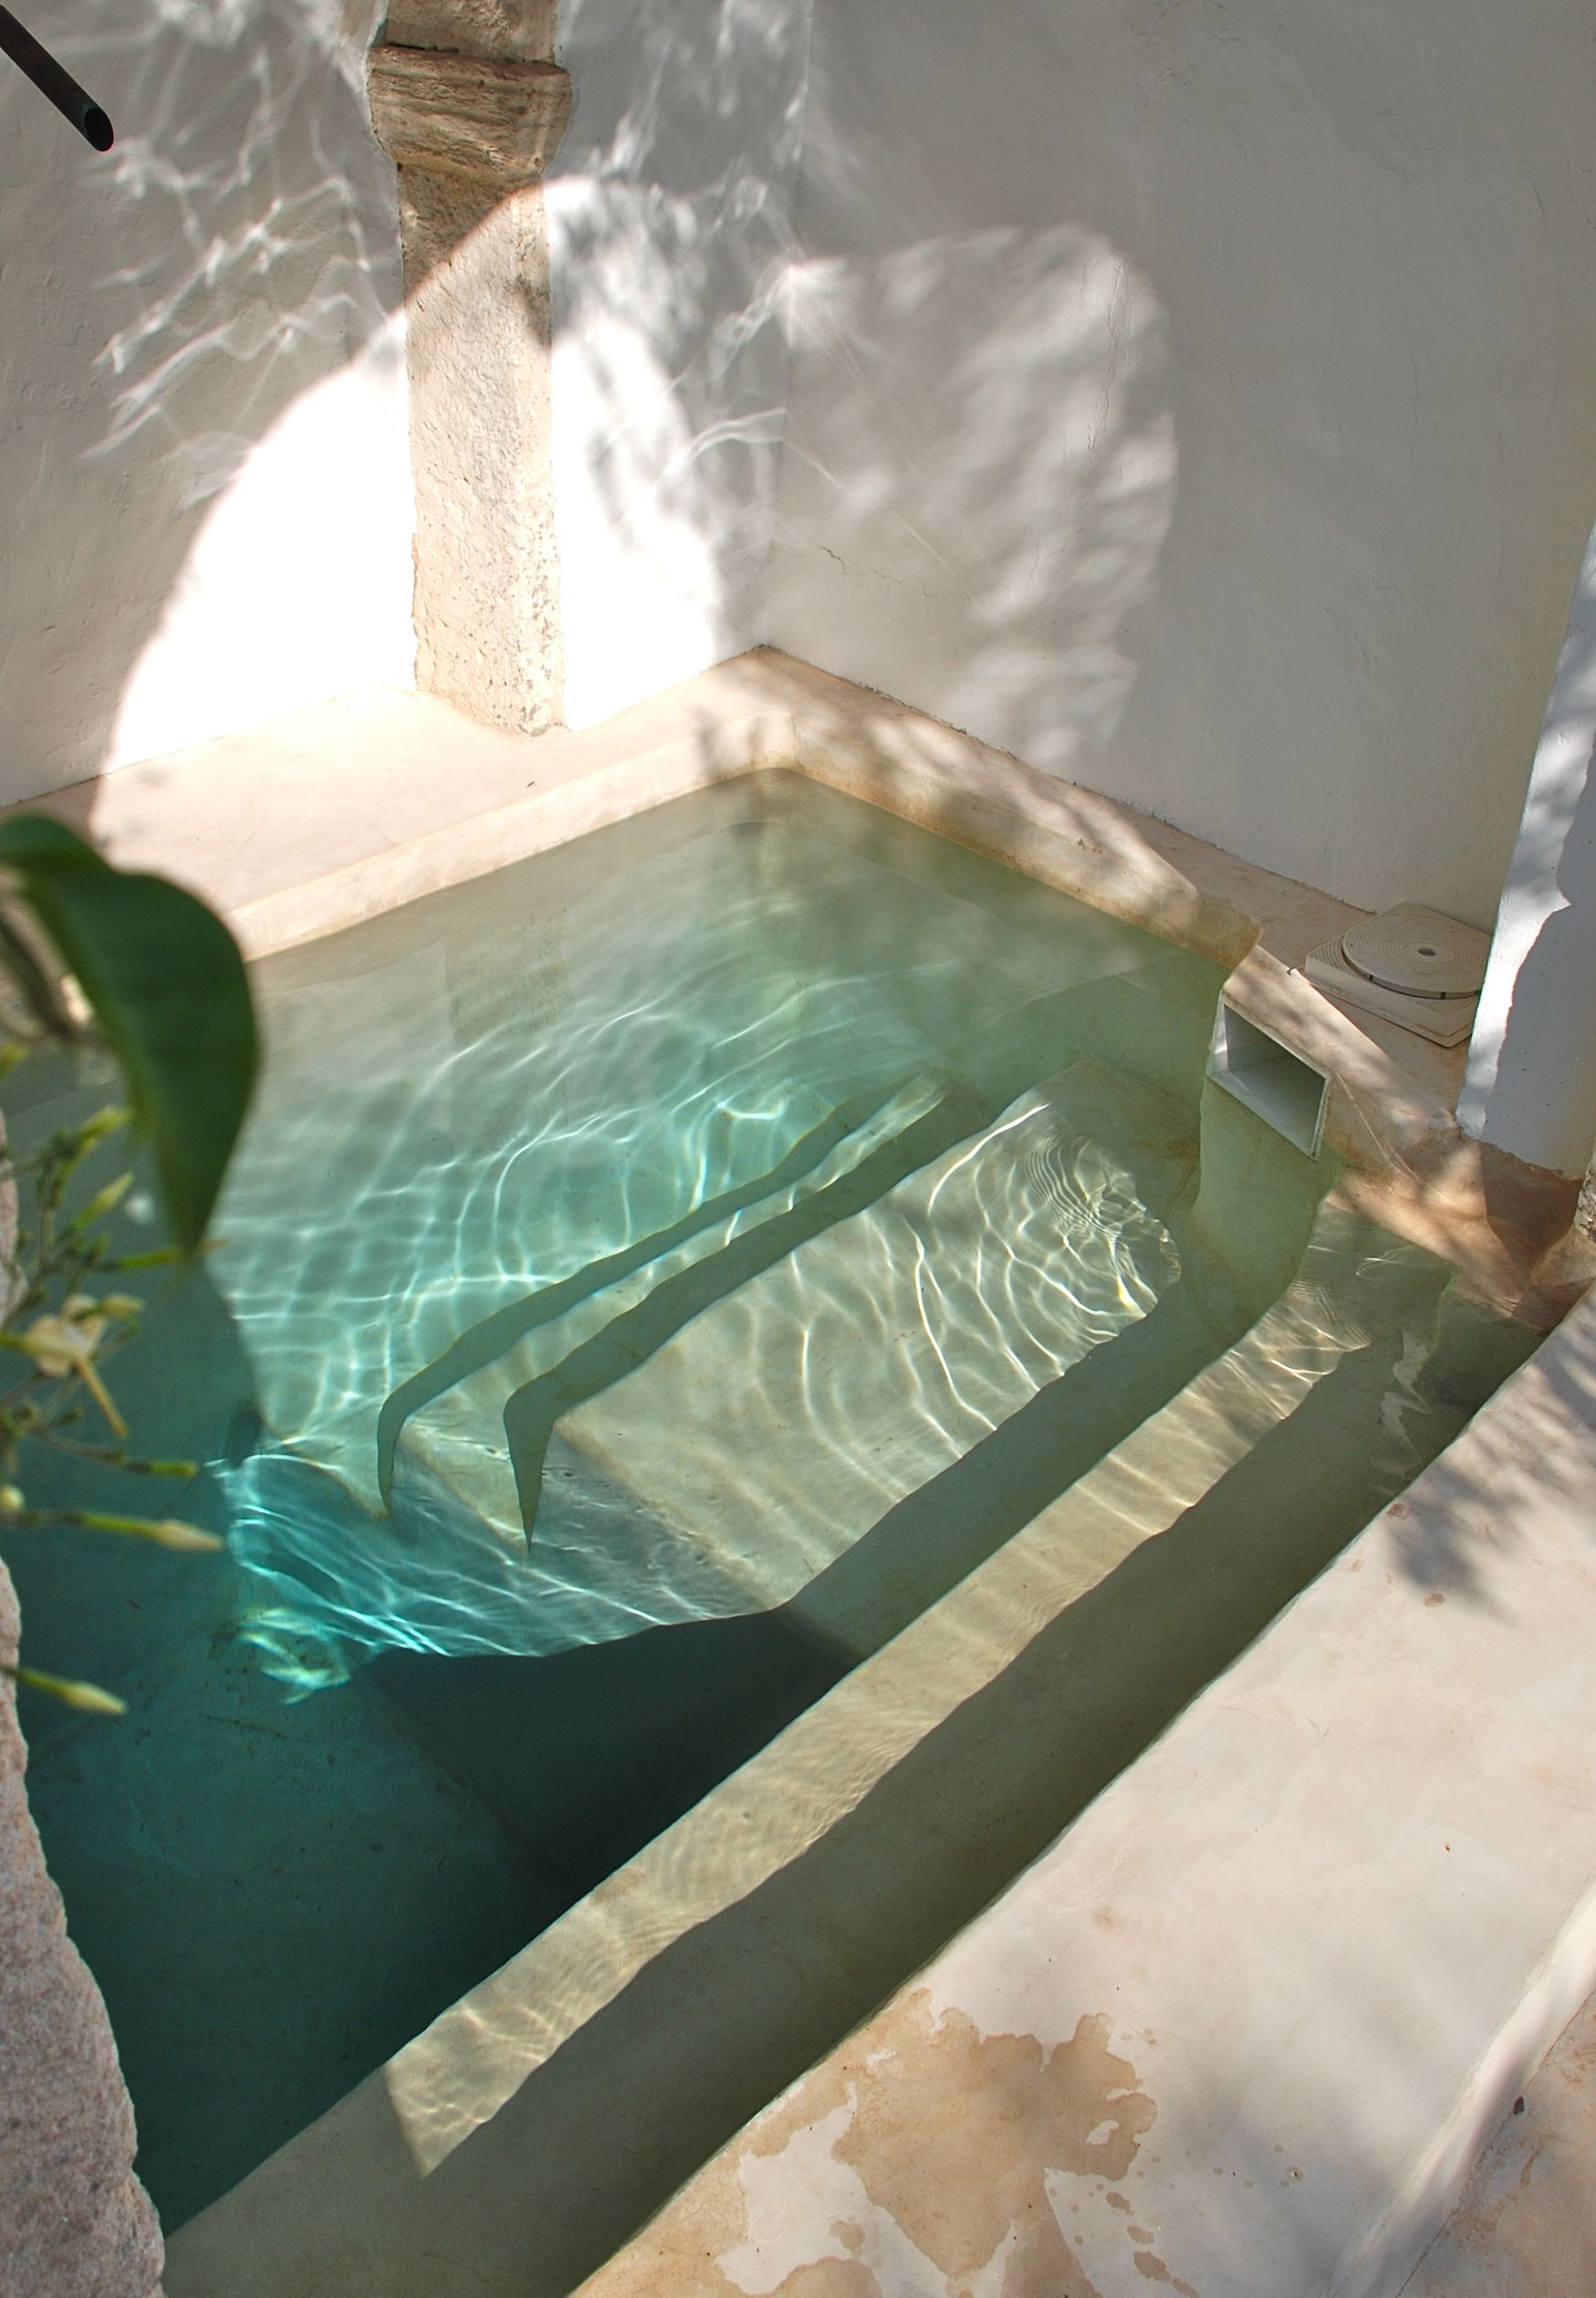 Já imaginou essa piscina privativa?